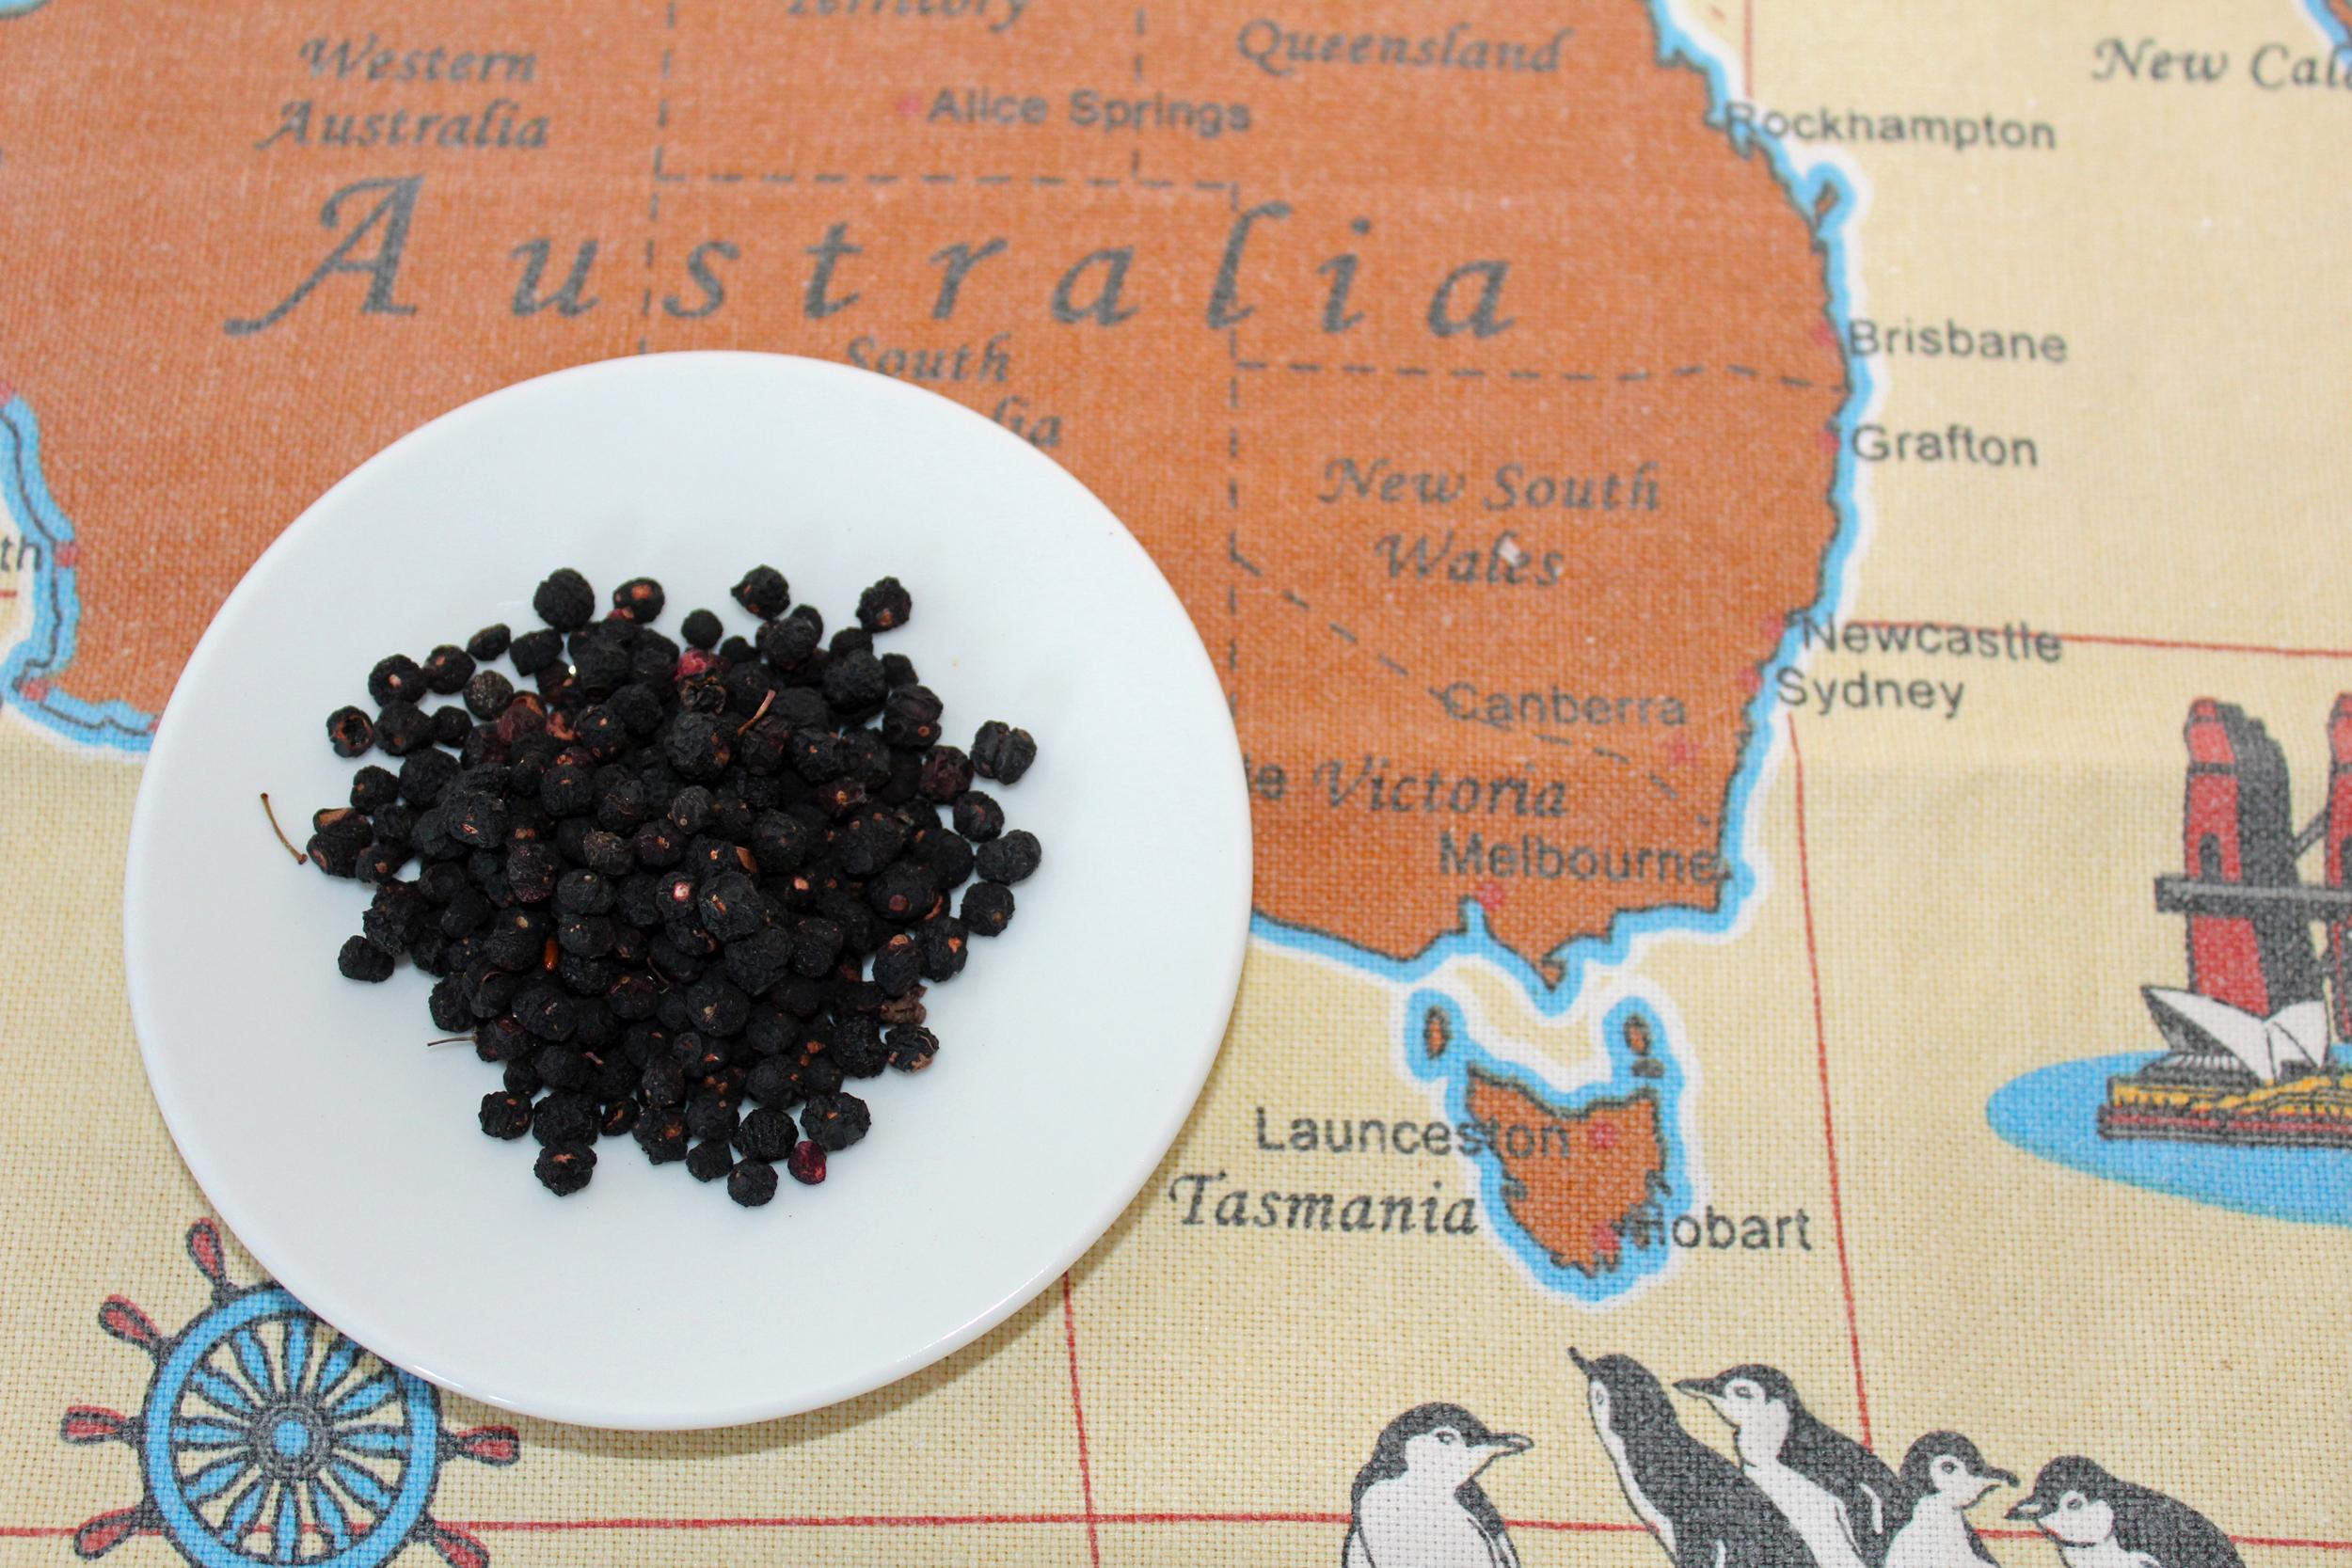 Tasmania pepe pepe DELLA Tasmania 25 g pepe fruttato